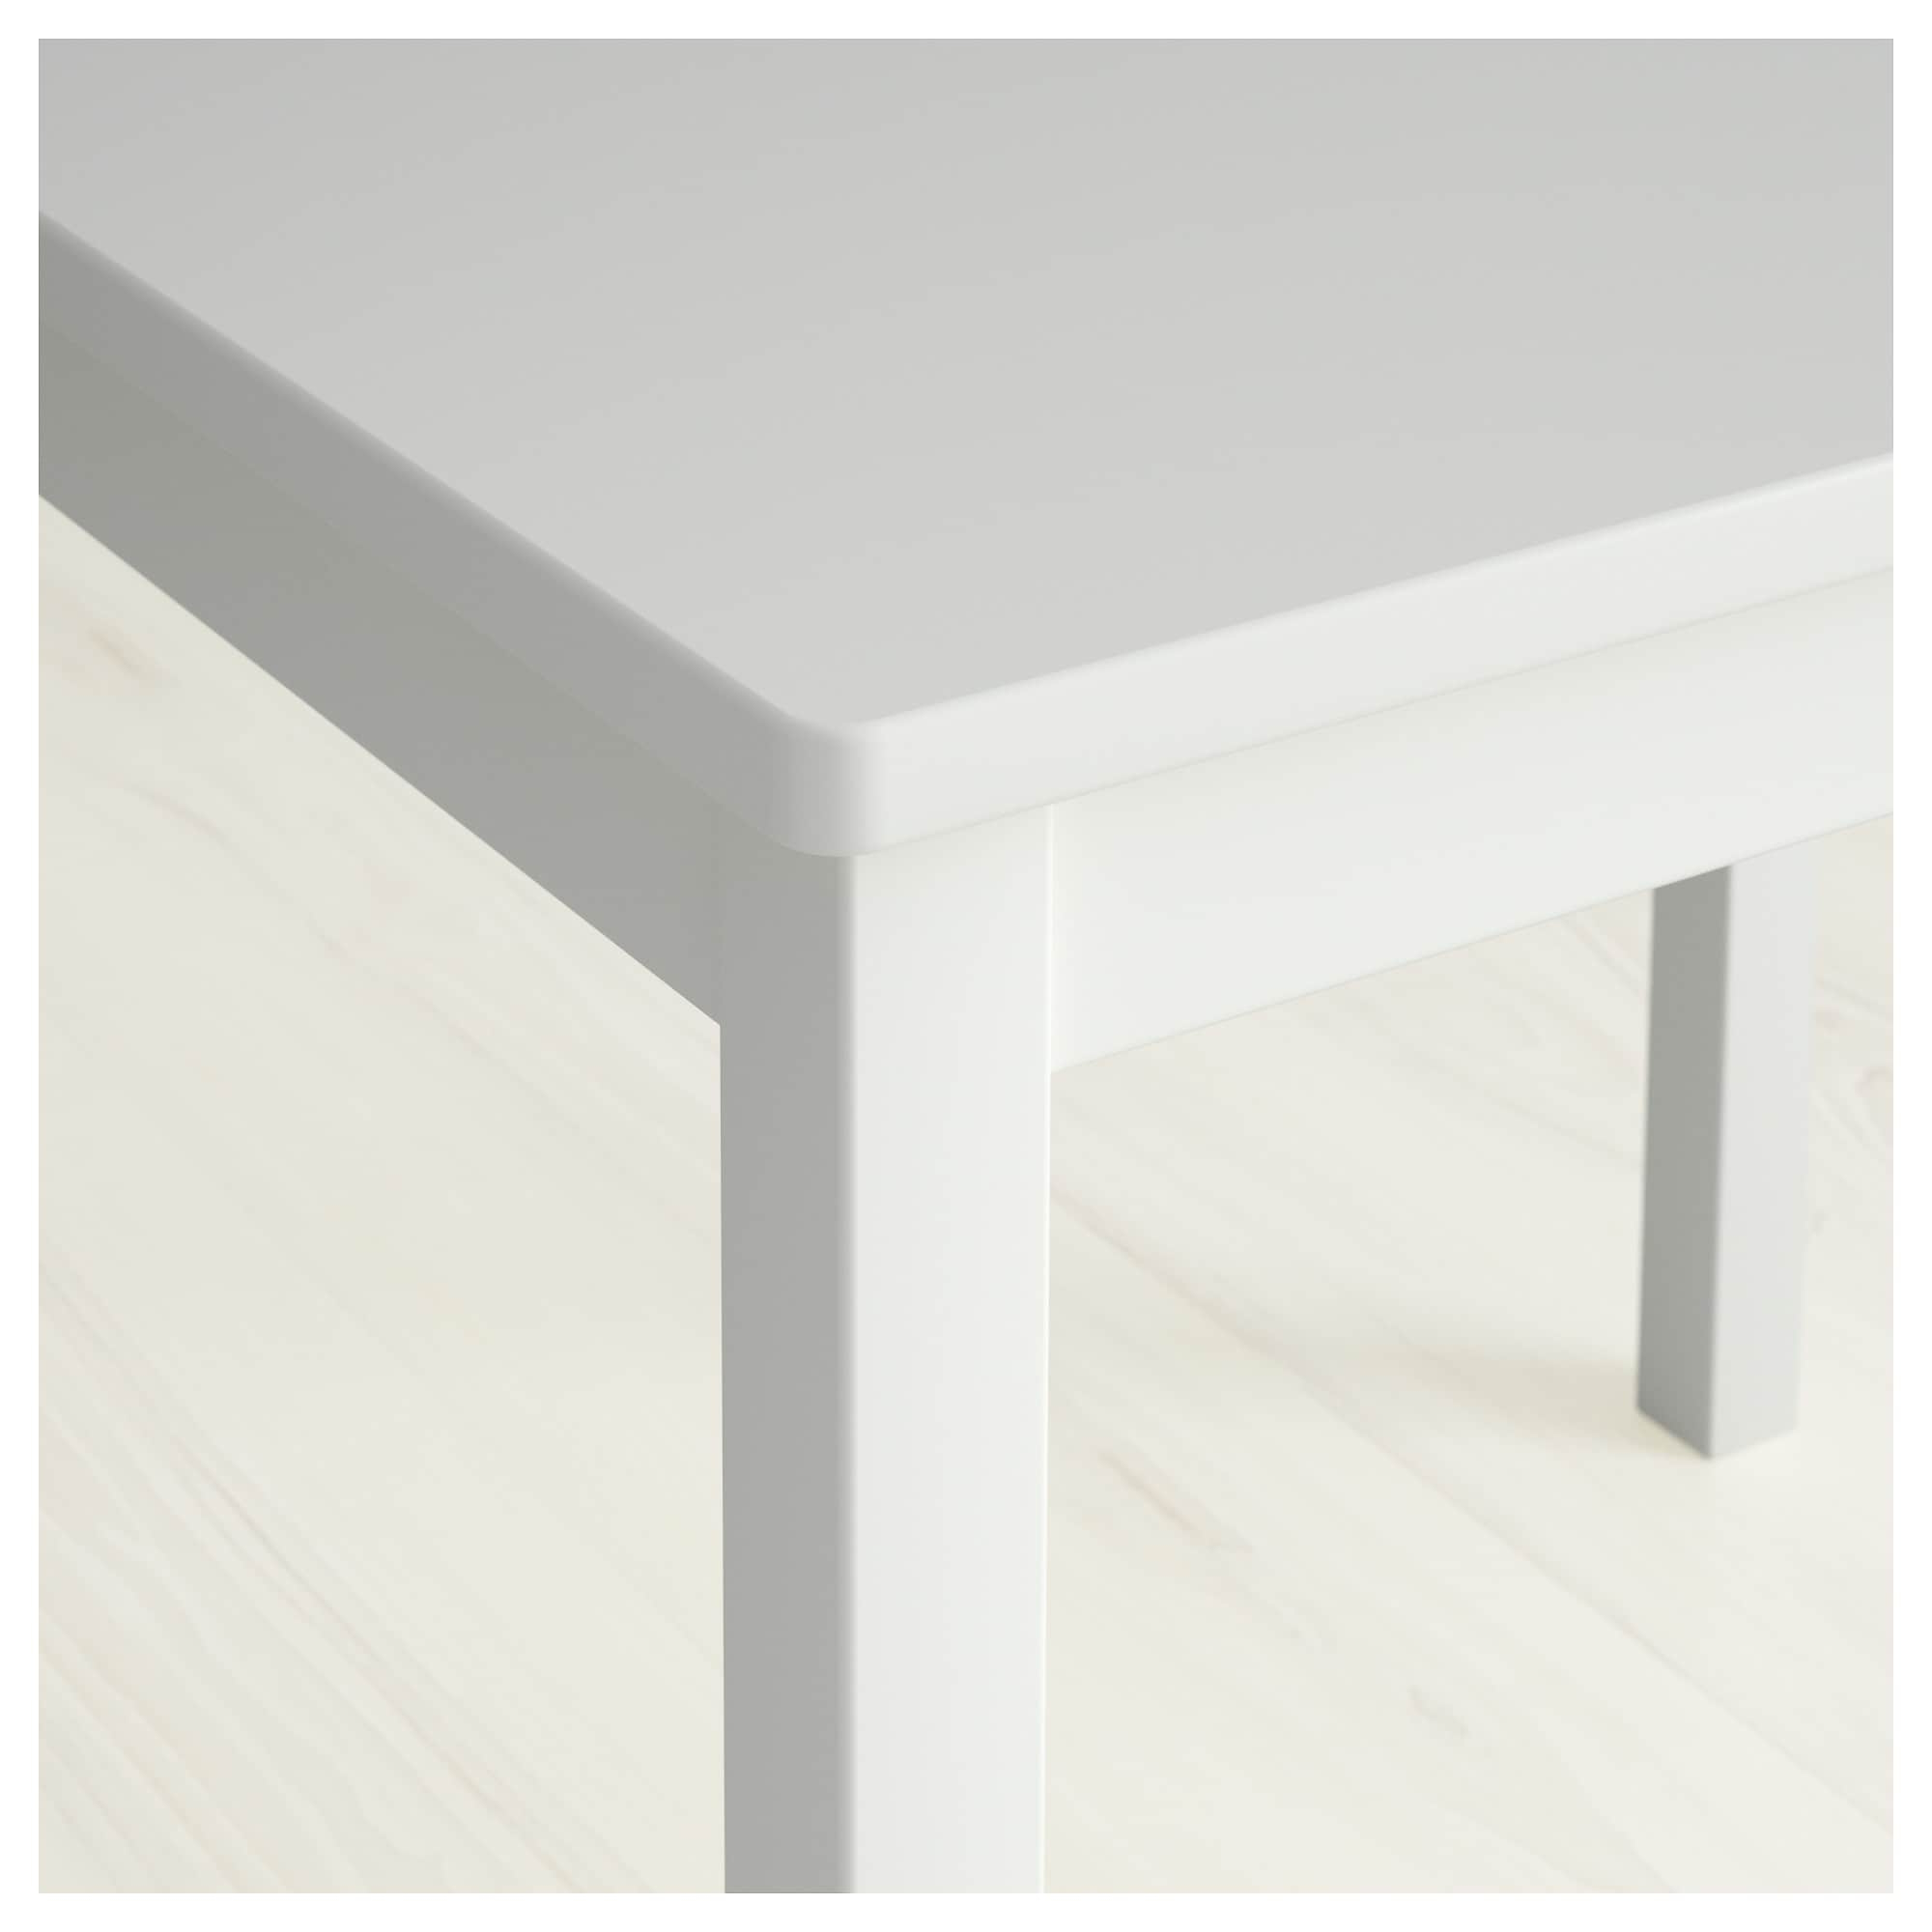 Armarios Ikea Niños Ipdd Kritter Mesa Para Nià Os Blanco 59 X 50 Cm Ikea